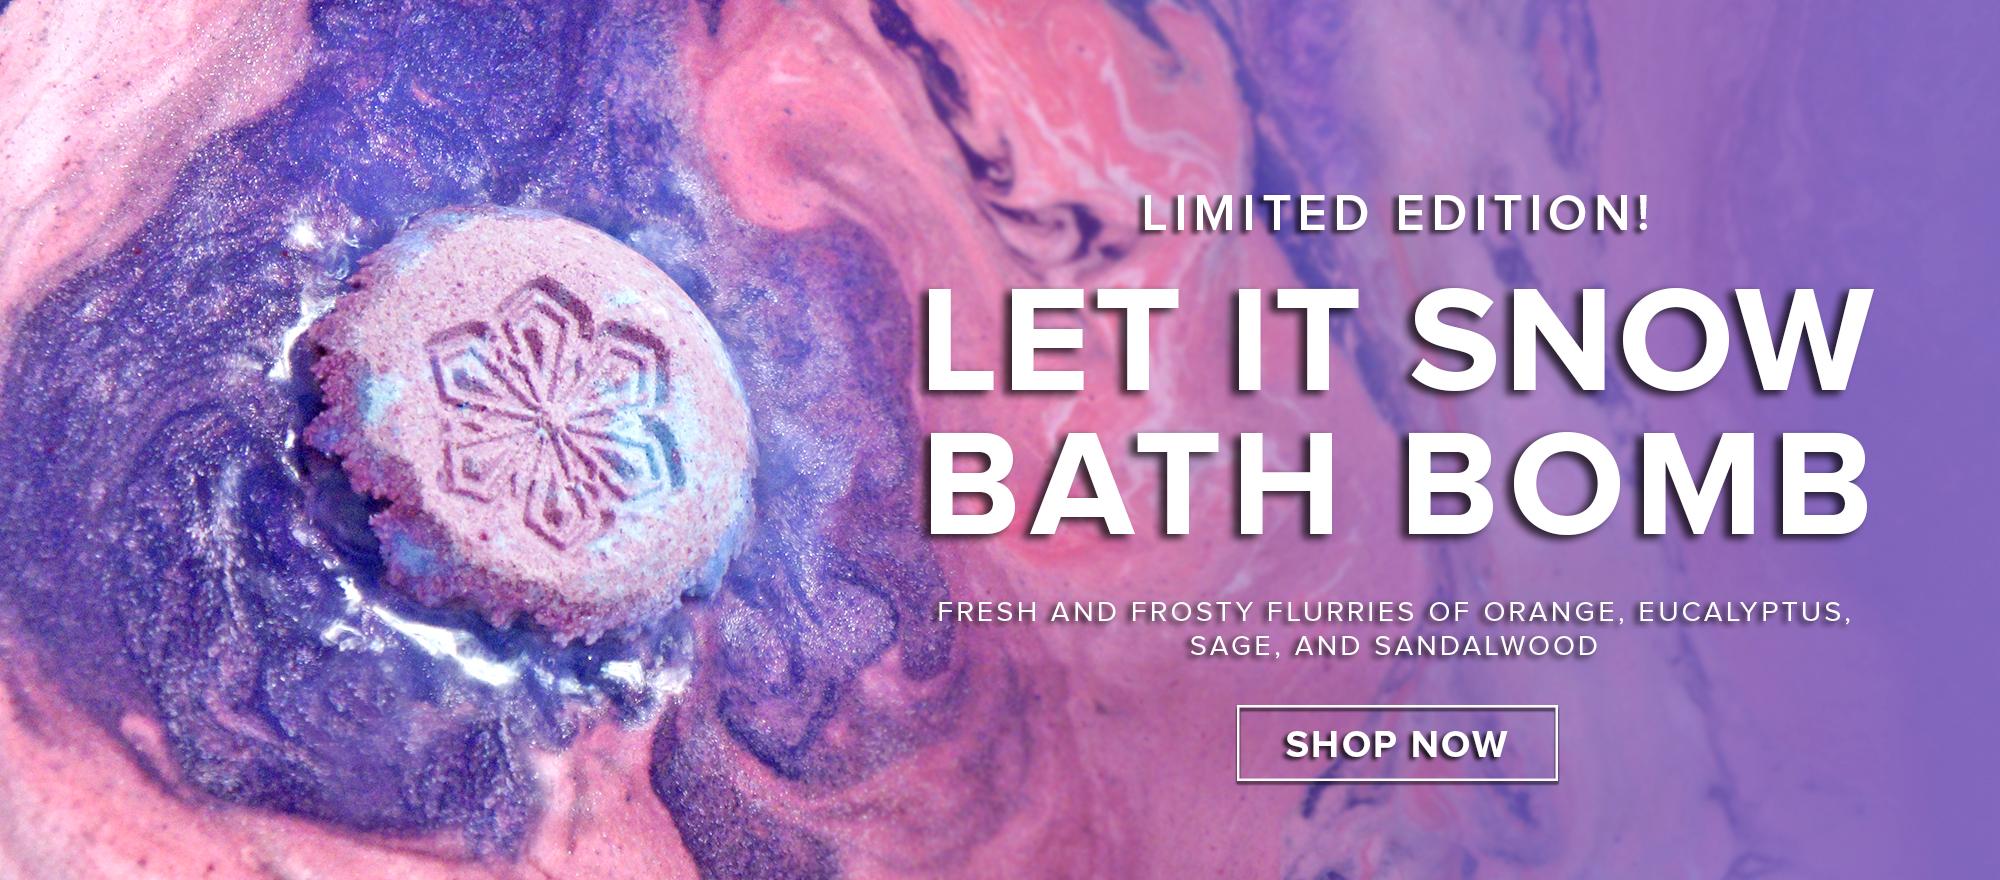 Let It Snow Bath Bomb